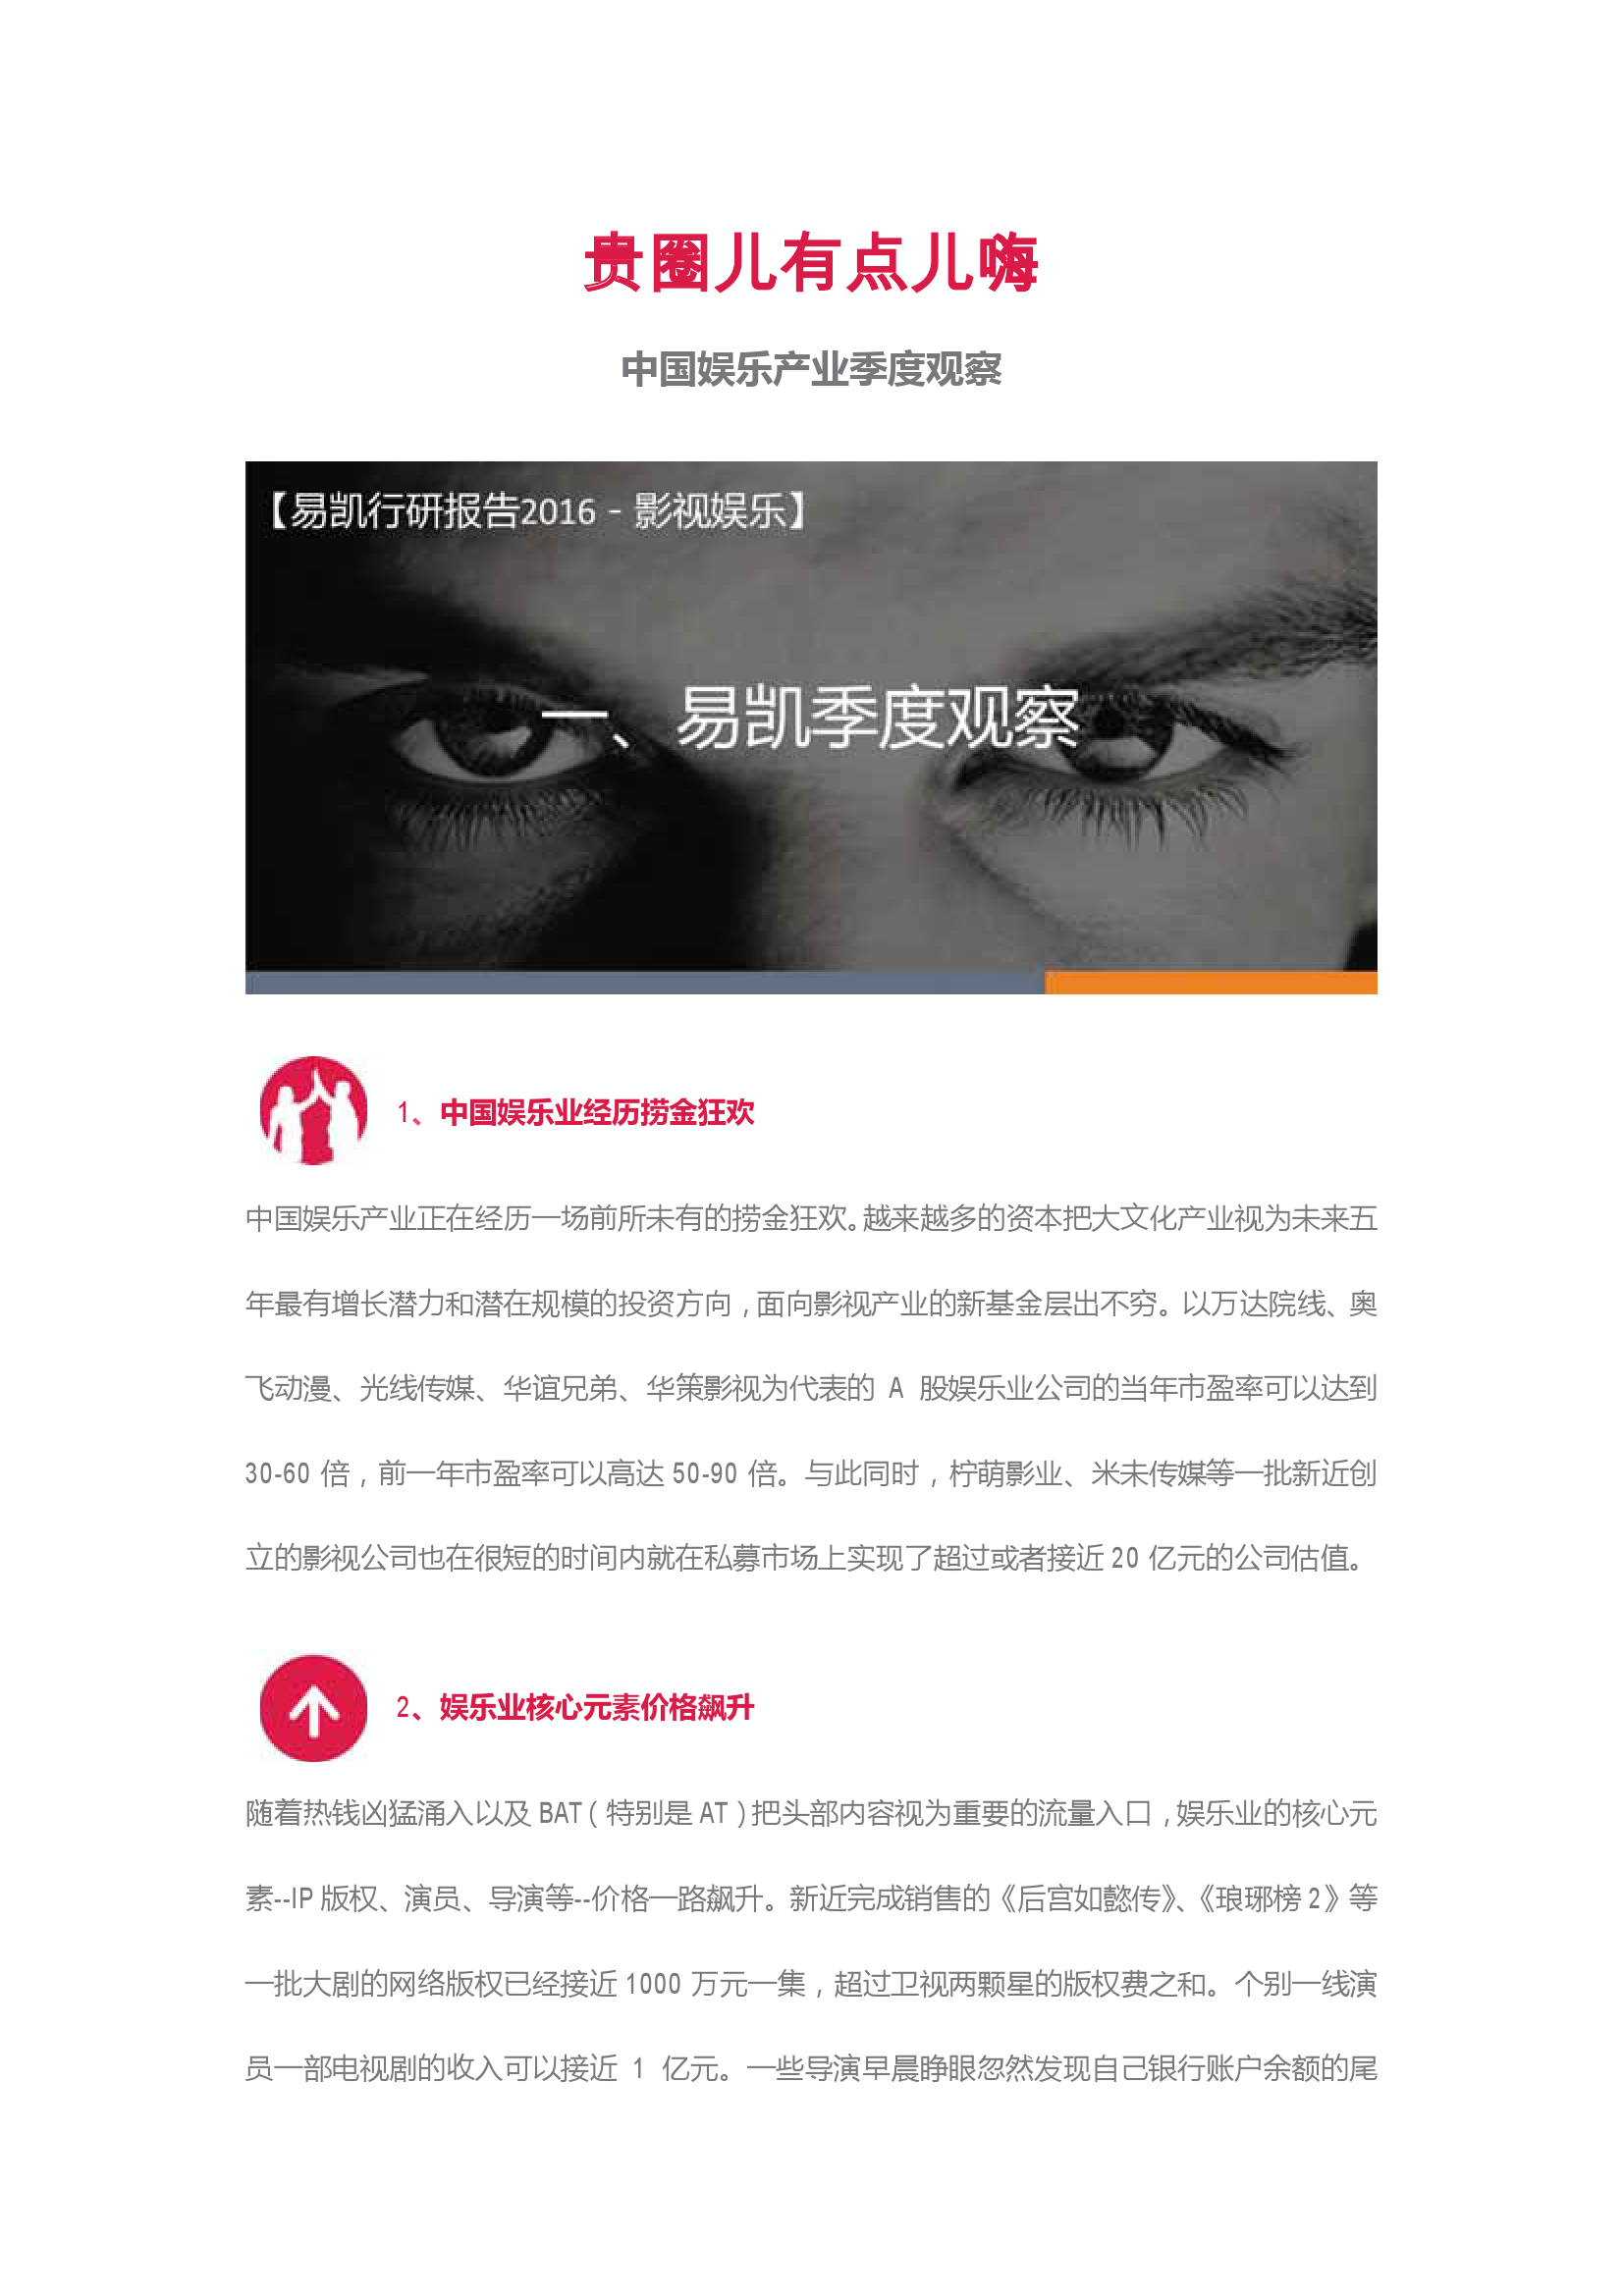 2016Q1中国娱乐产业季度观察_000001